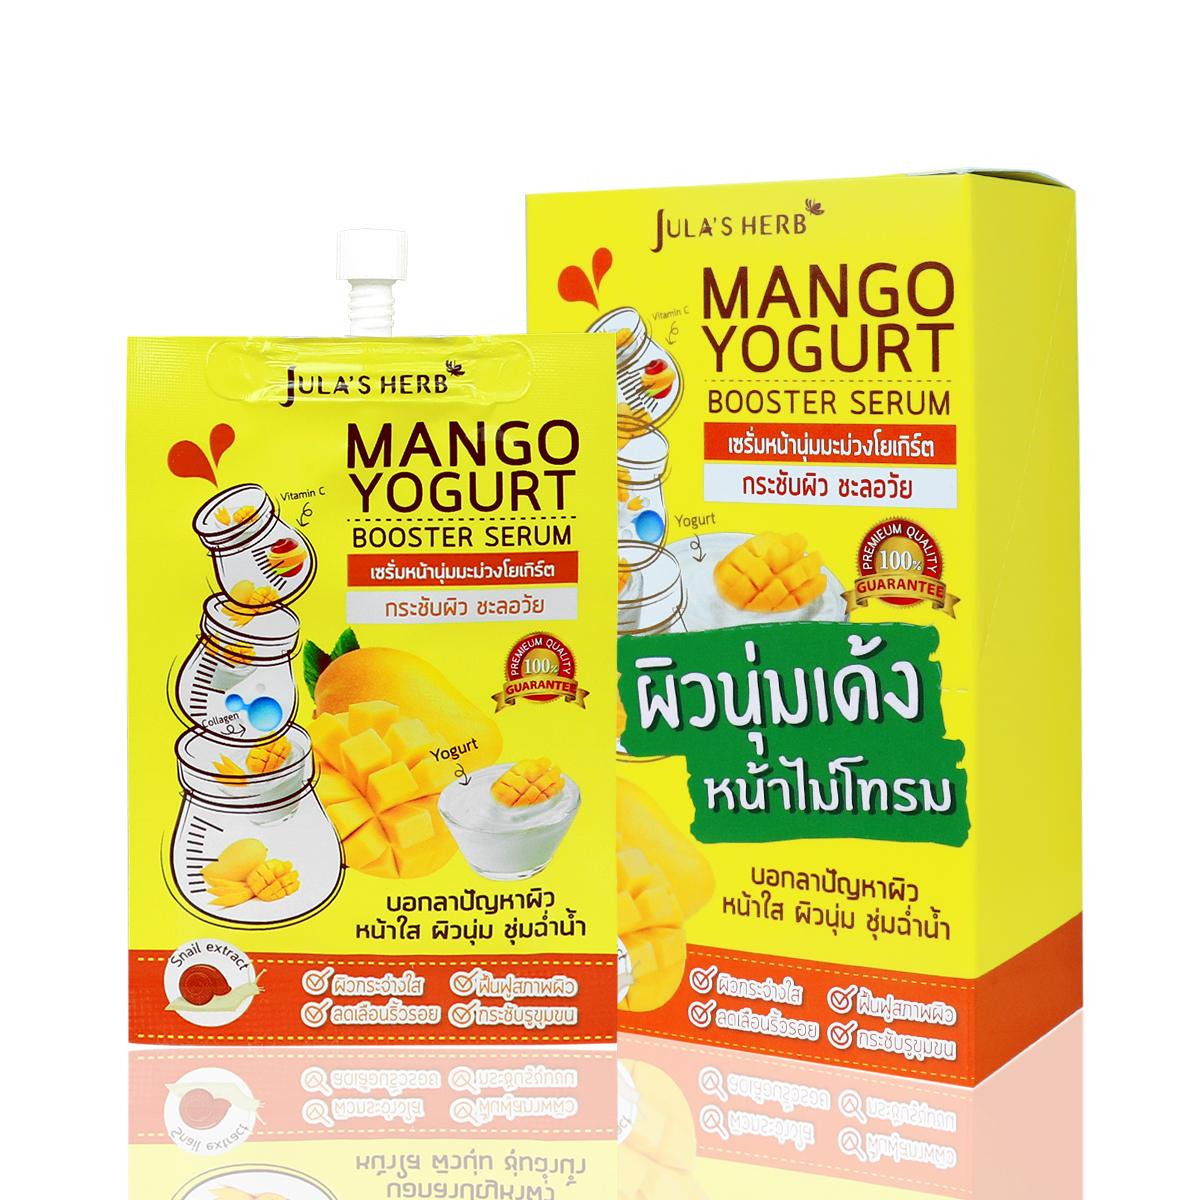 Mango Yogurt Booster Serum เซรั่มหน้านุ่มมะม่วงโยเกิร์ต